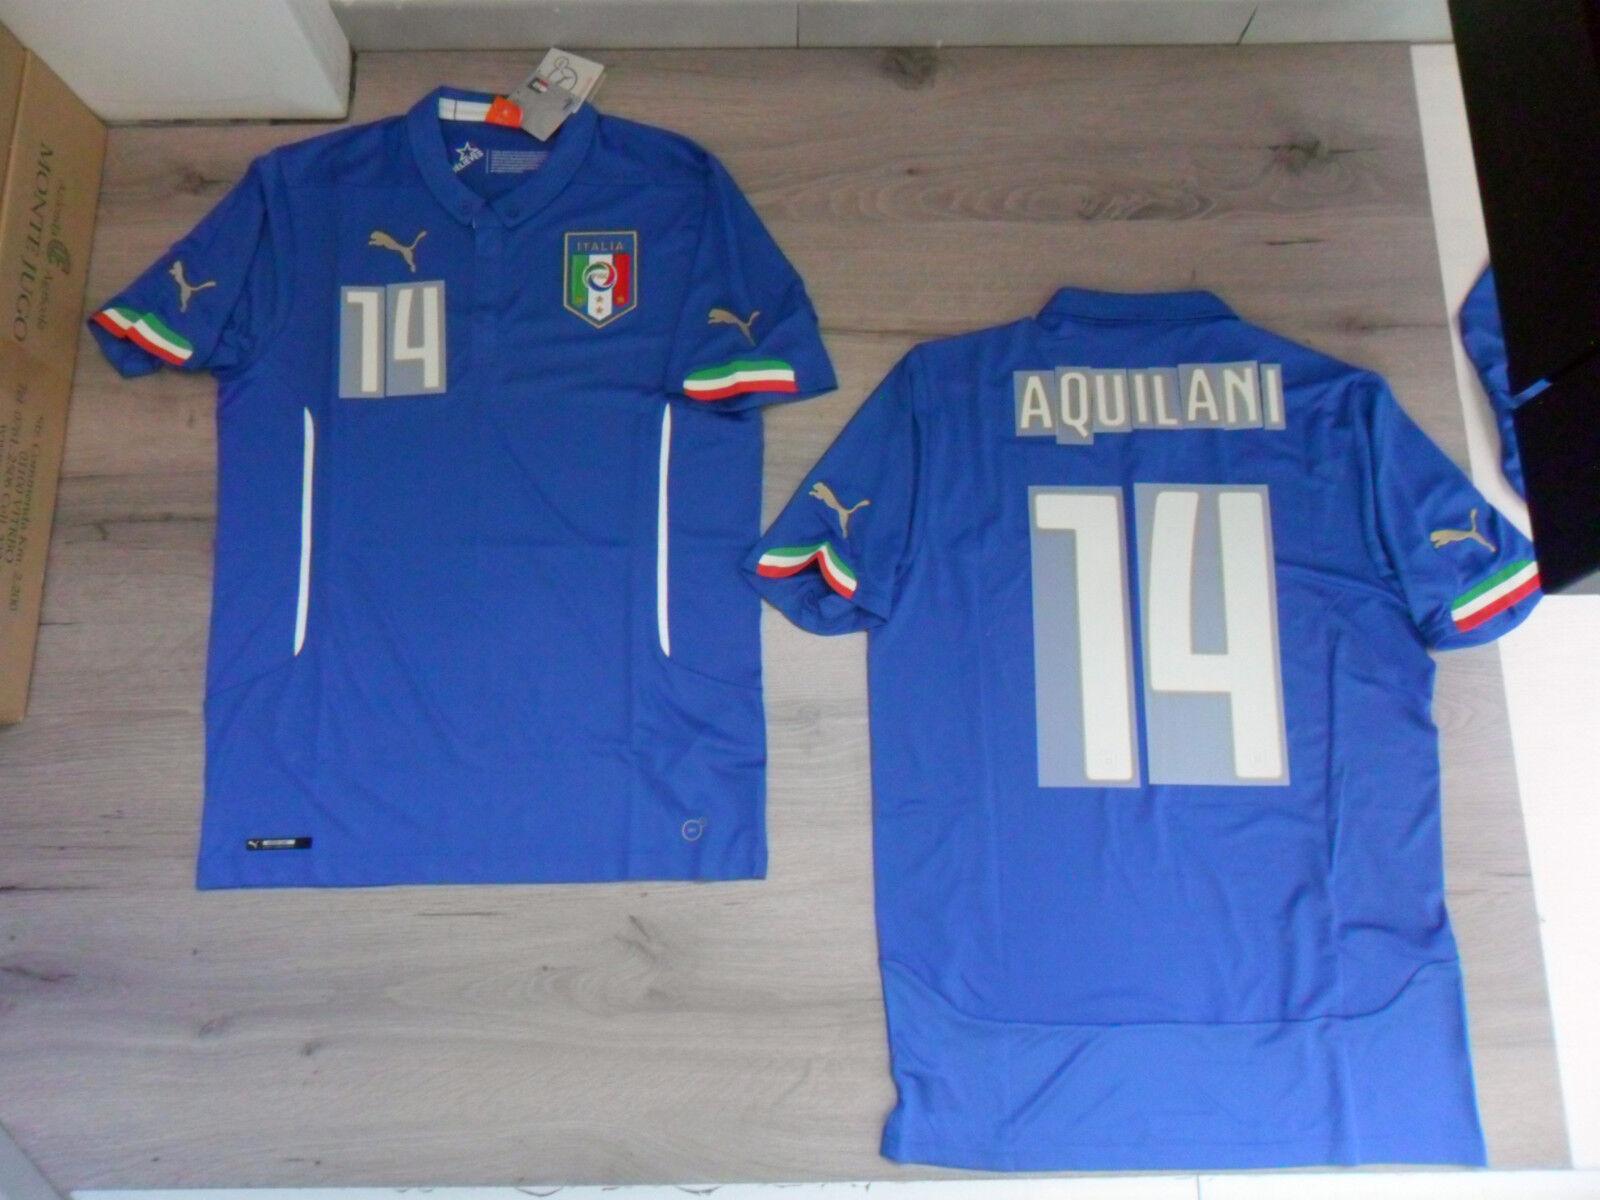 FW14 PUMA S NACH HAUSE ITALIEN 14 AQUILANI T-SHIRT WELT TRIKOT JERSEY  | Niedriger Preis